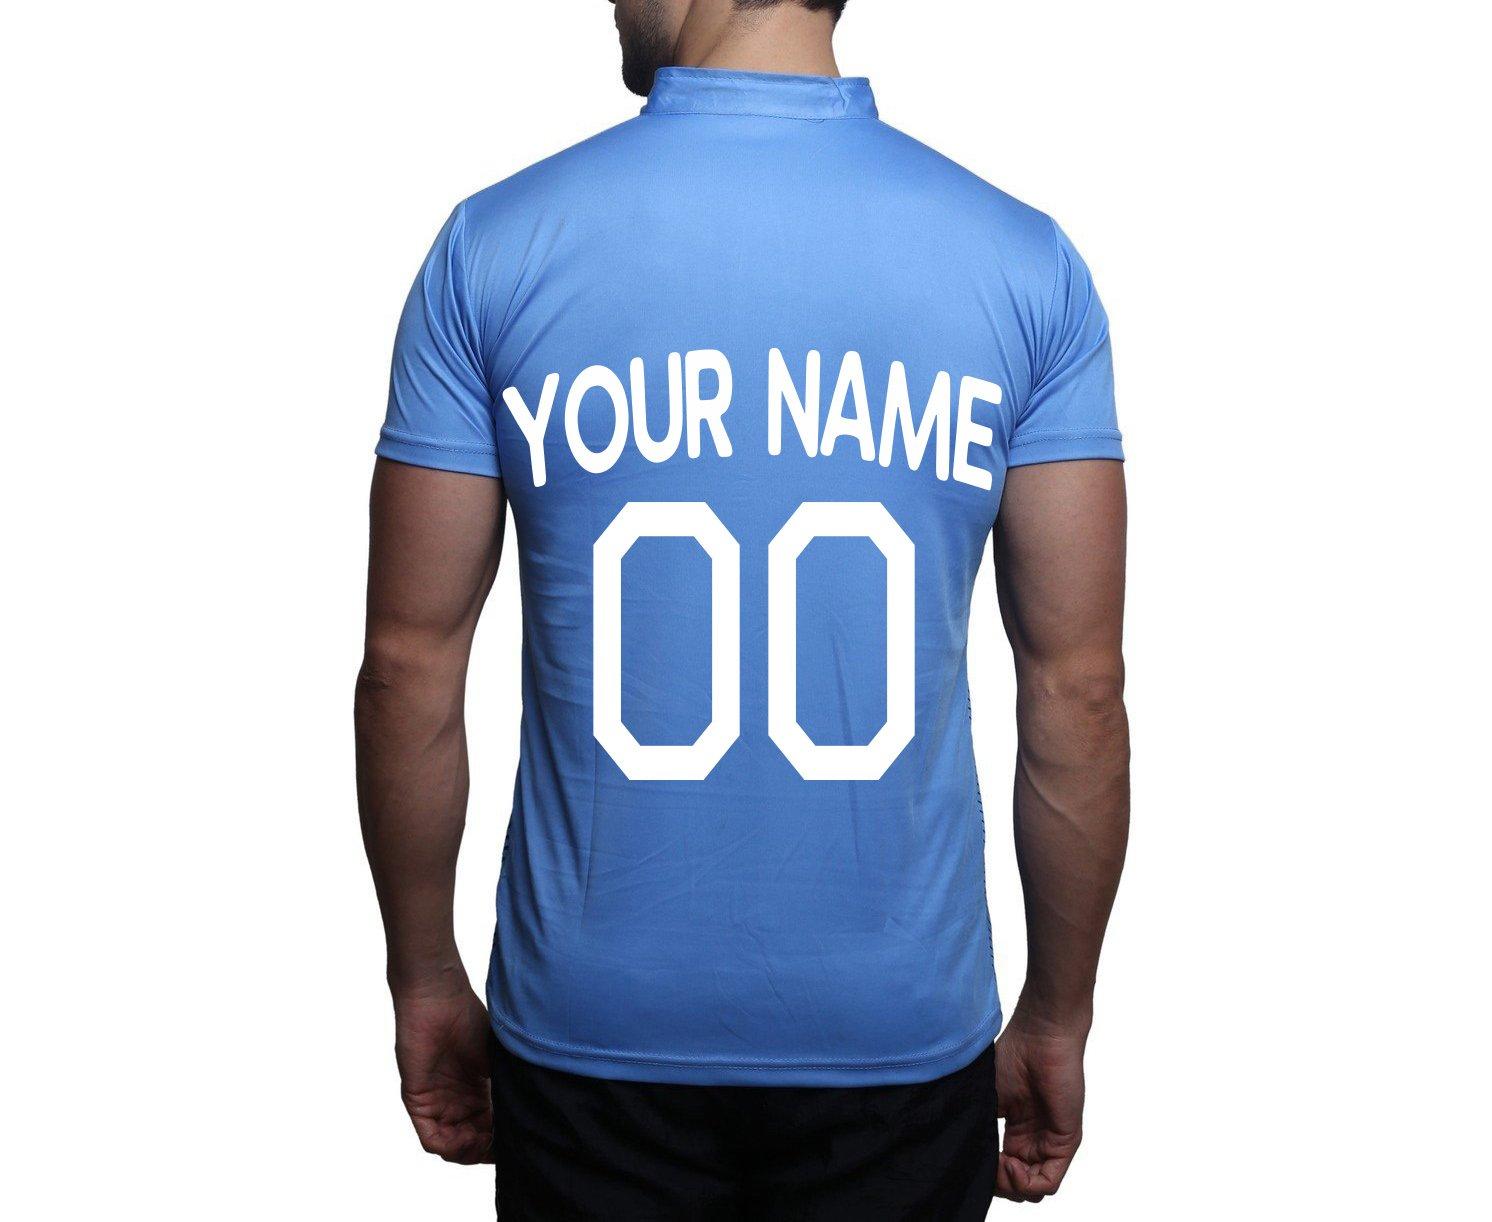 ac6996215 Amazon.com: Catman Cricket Jersey Indian Cricket Fan Jersey Personalised Cricket  Jersey: Sports & Outdoors